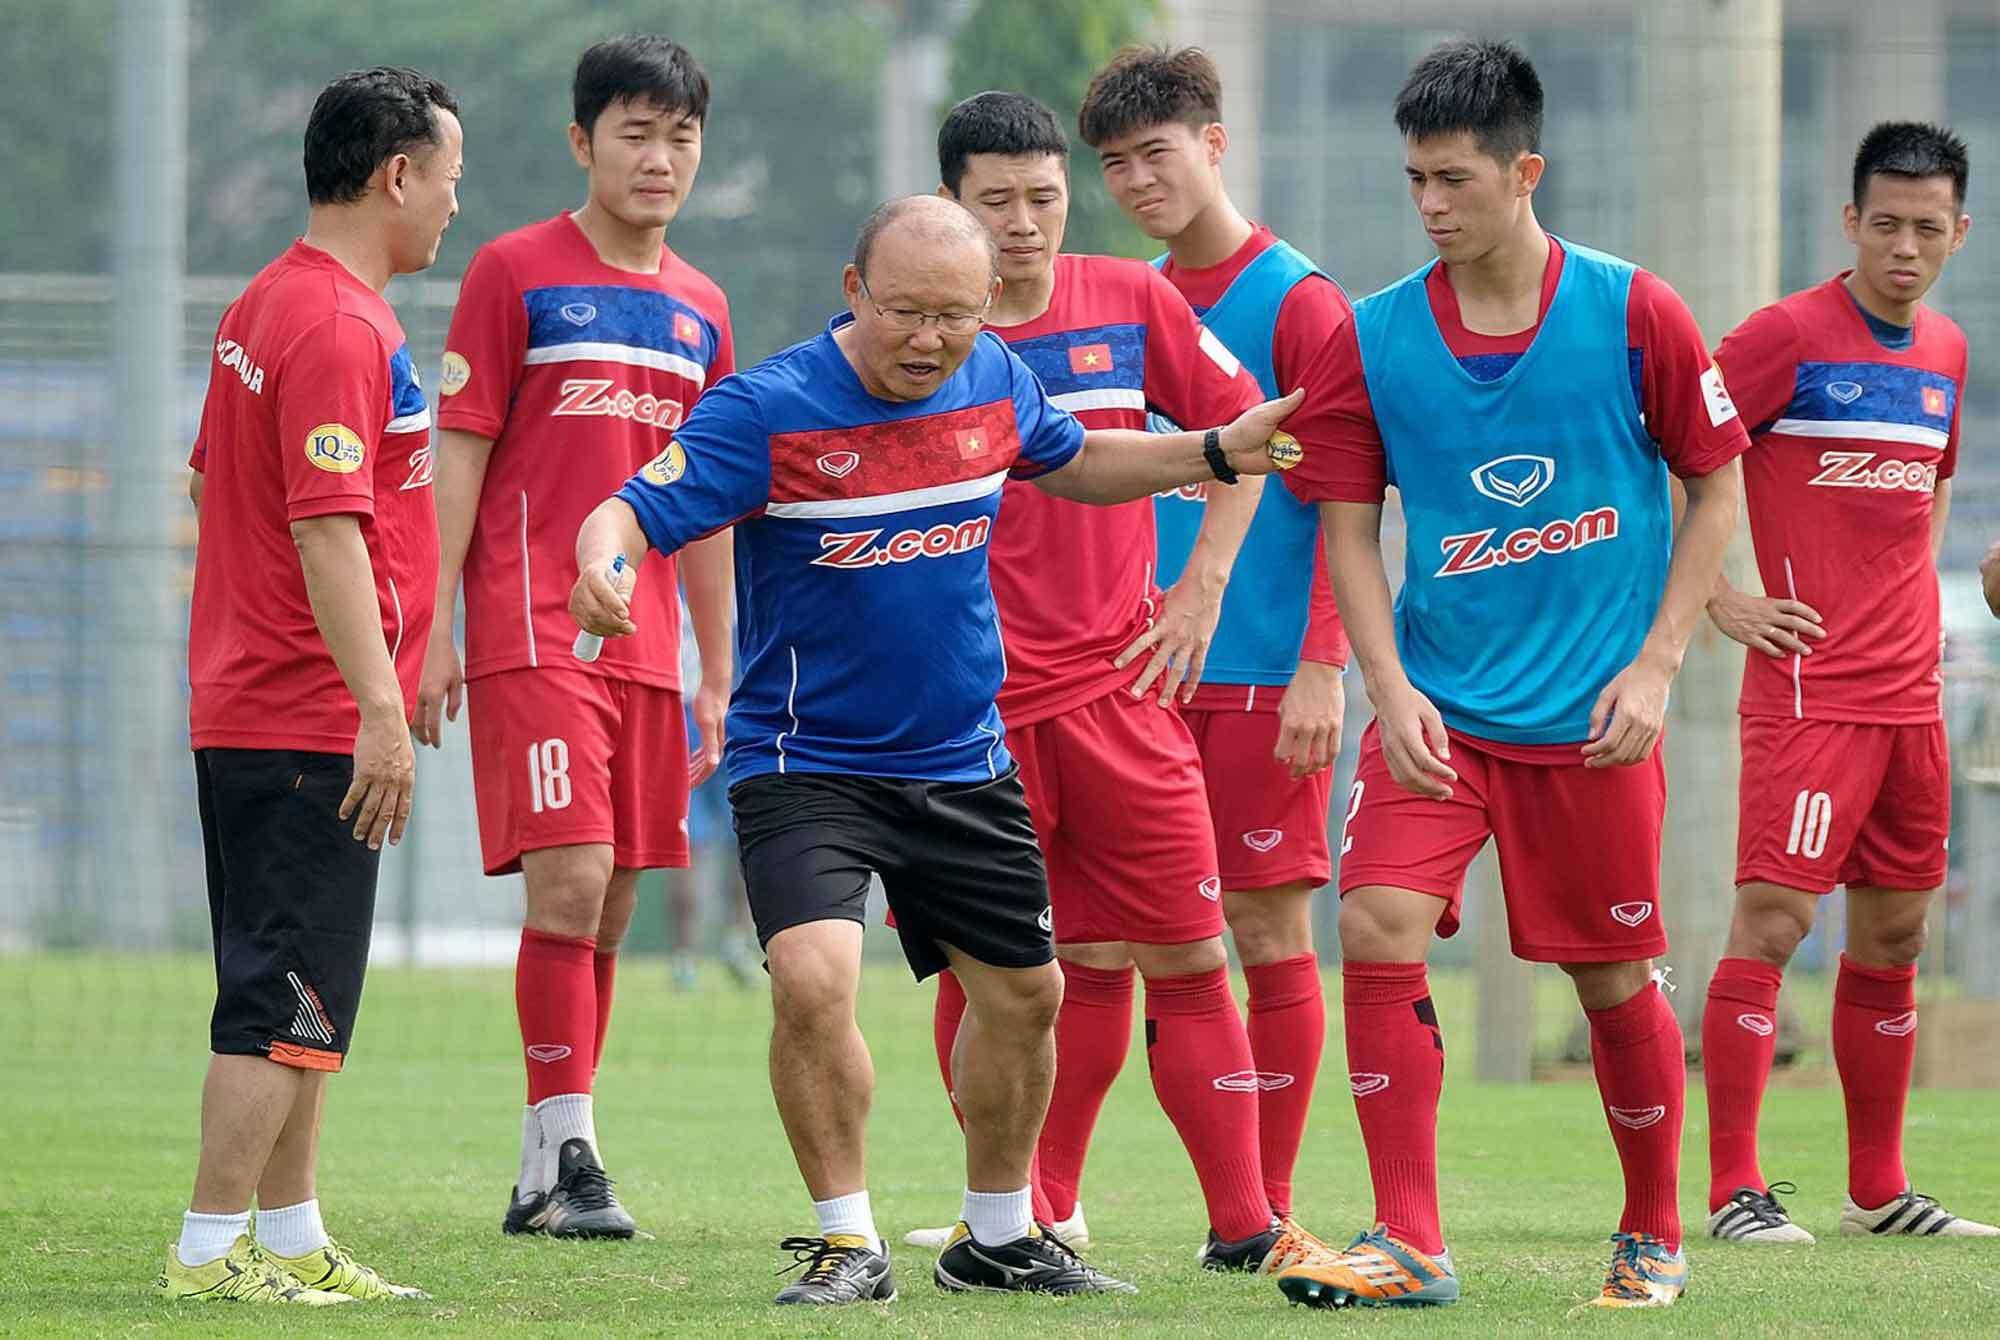 Park Hang Seo, HLV Park Hang Seo, U23 Việt Nam, Chung kết U23